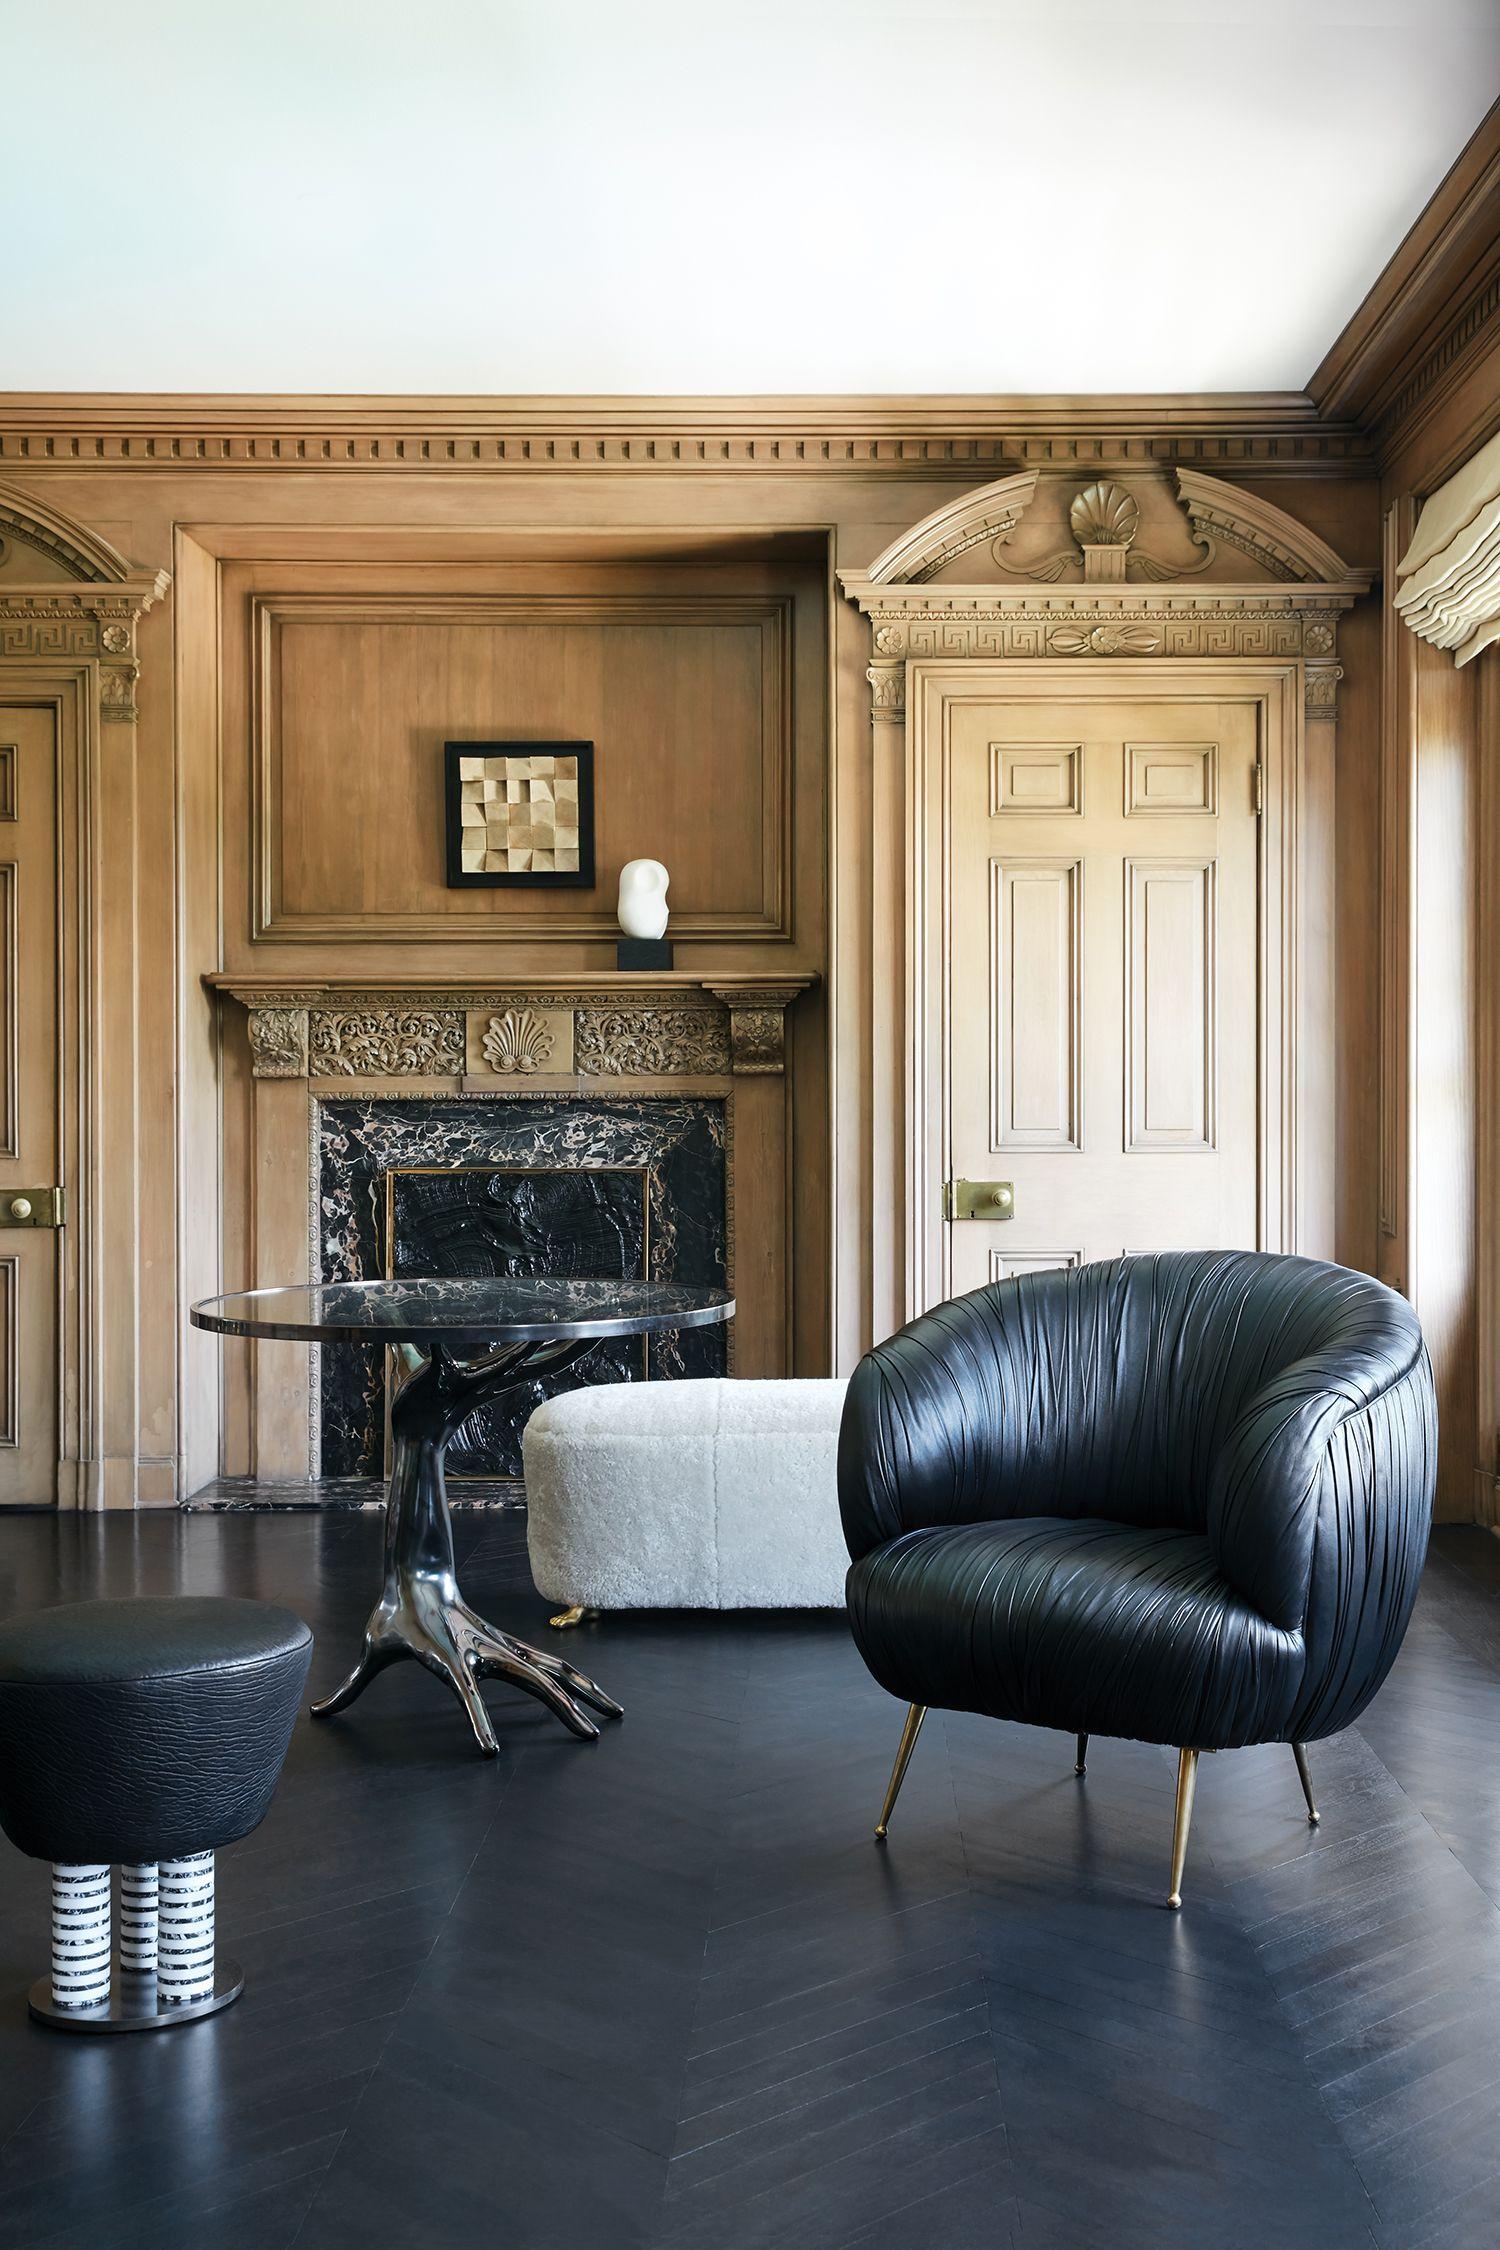 Oleum Sculpture By Kelly Wearstler In 2021 Furniture Furniture Design Luxury Furniture